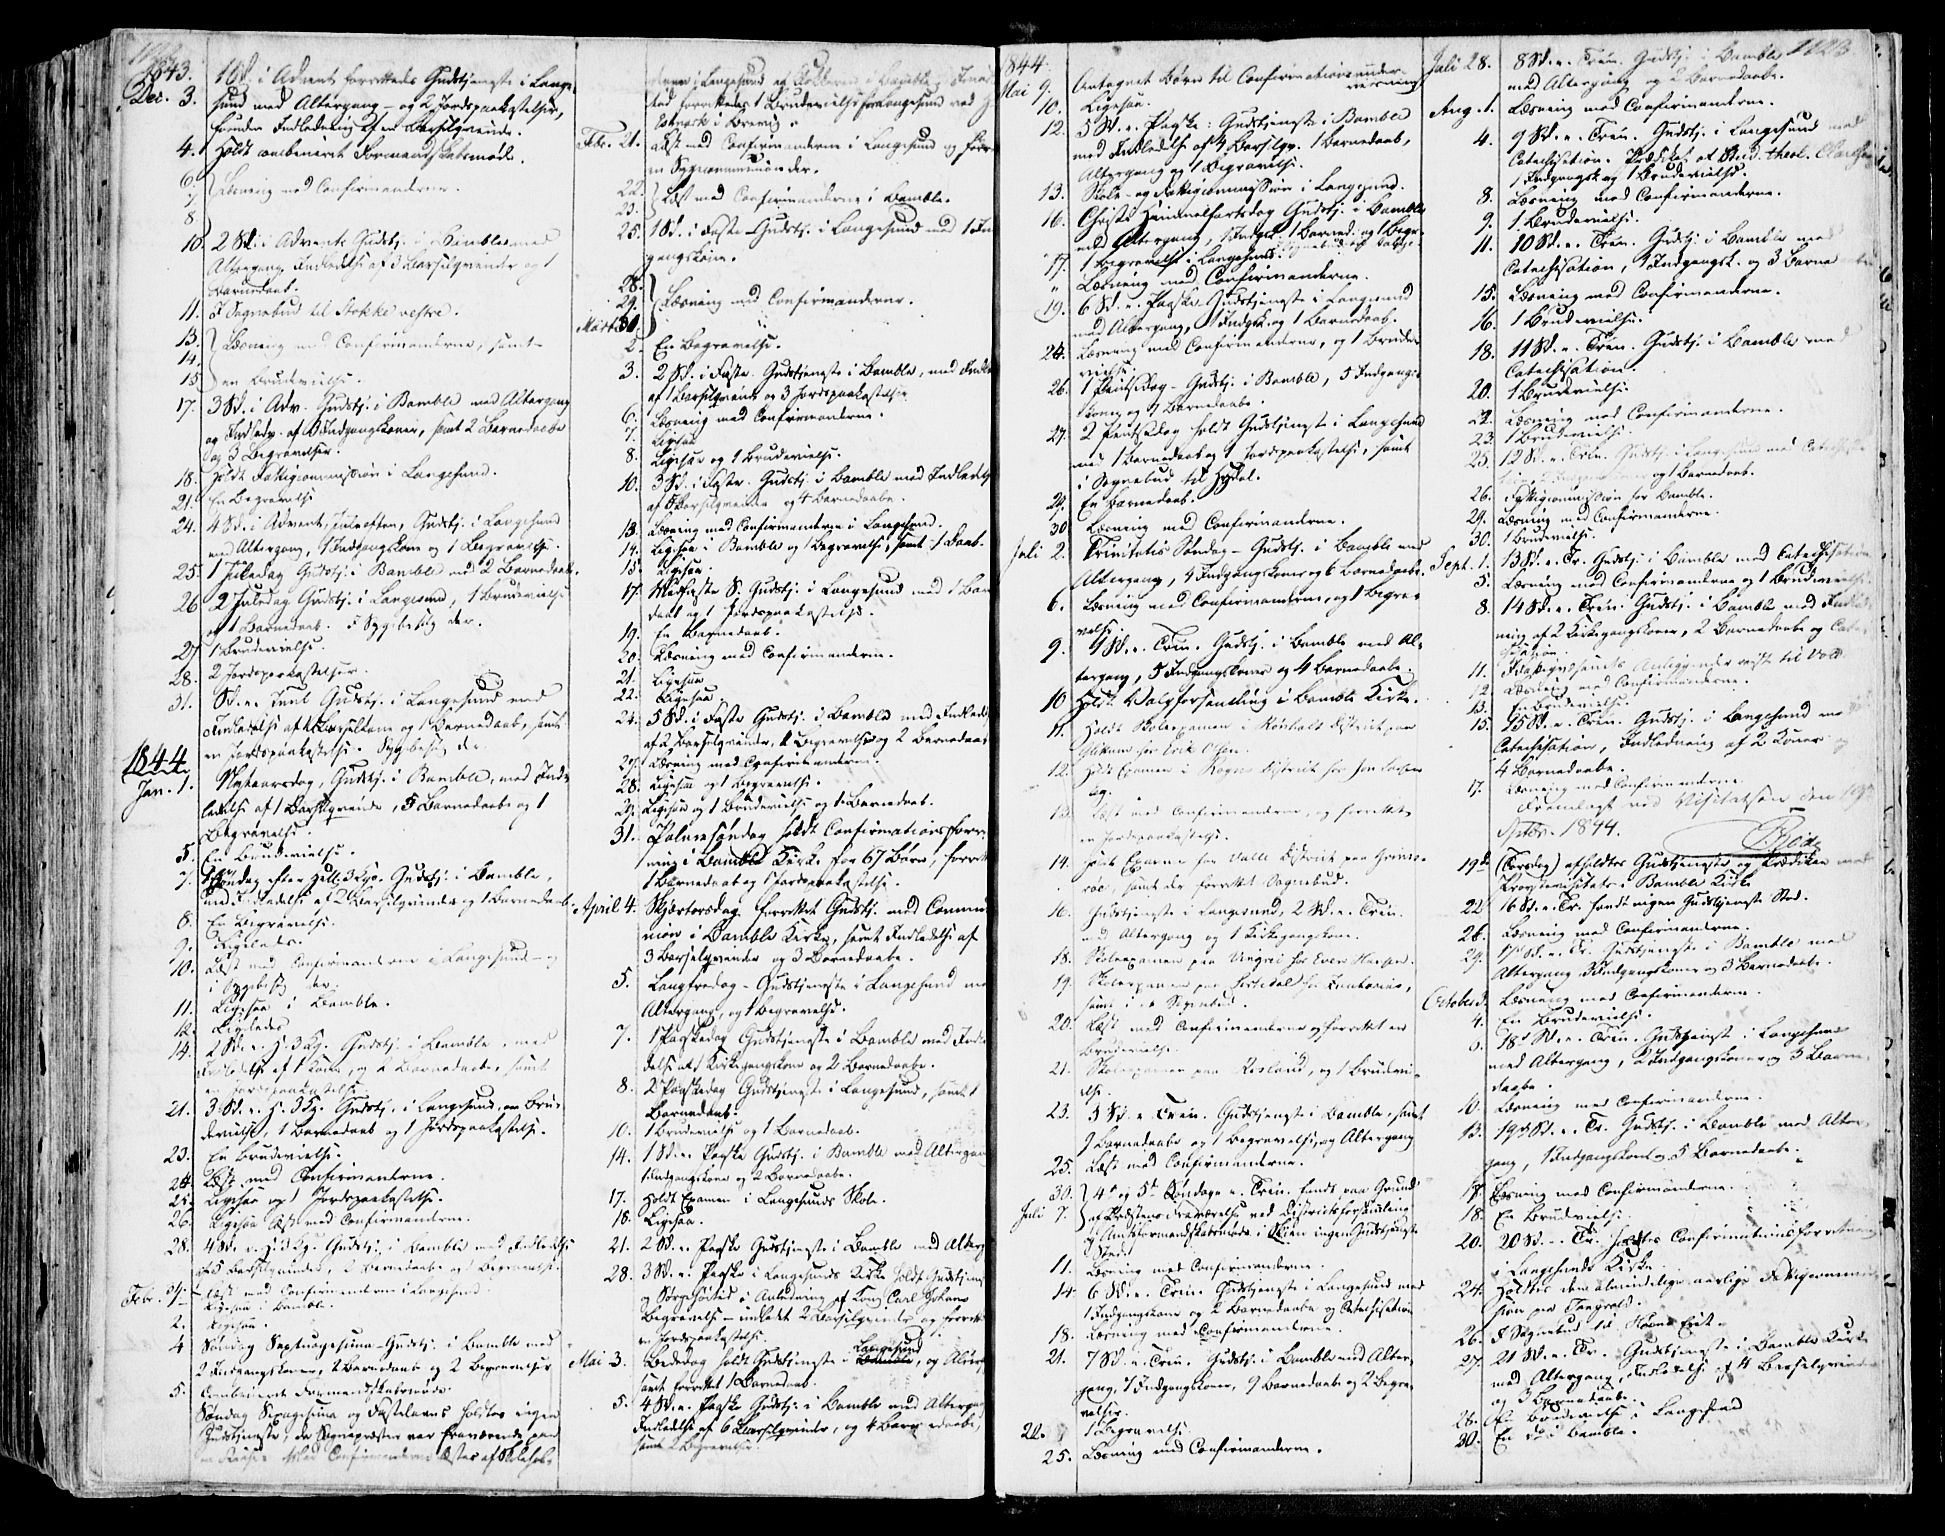 SAKO, Bamble kirkebøker, F/Fa/L0004: Ministerialbok nr. I 4, 1834-1853, s. 1122-1123